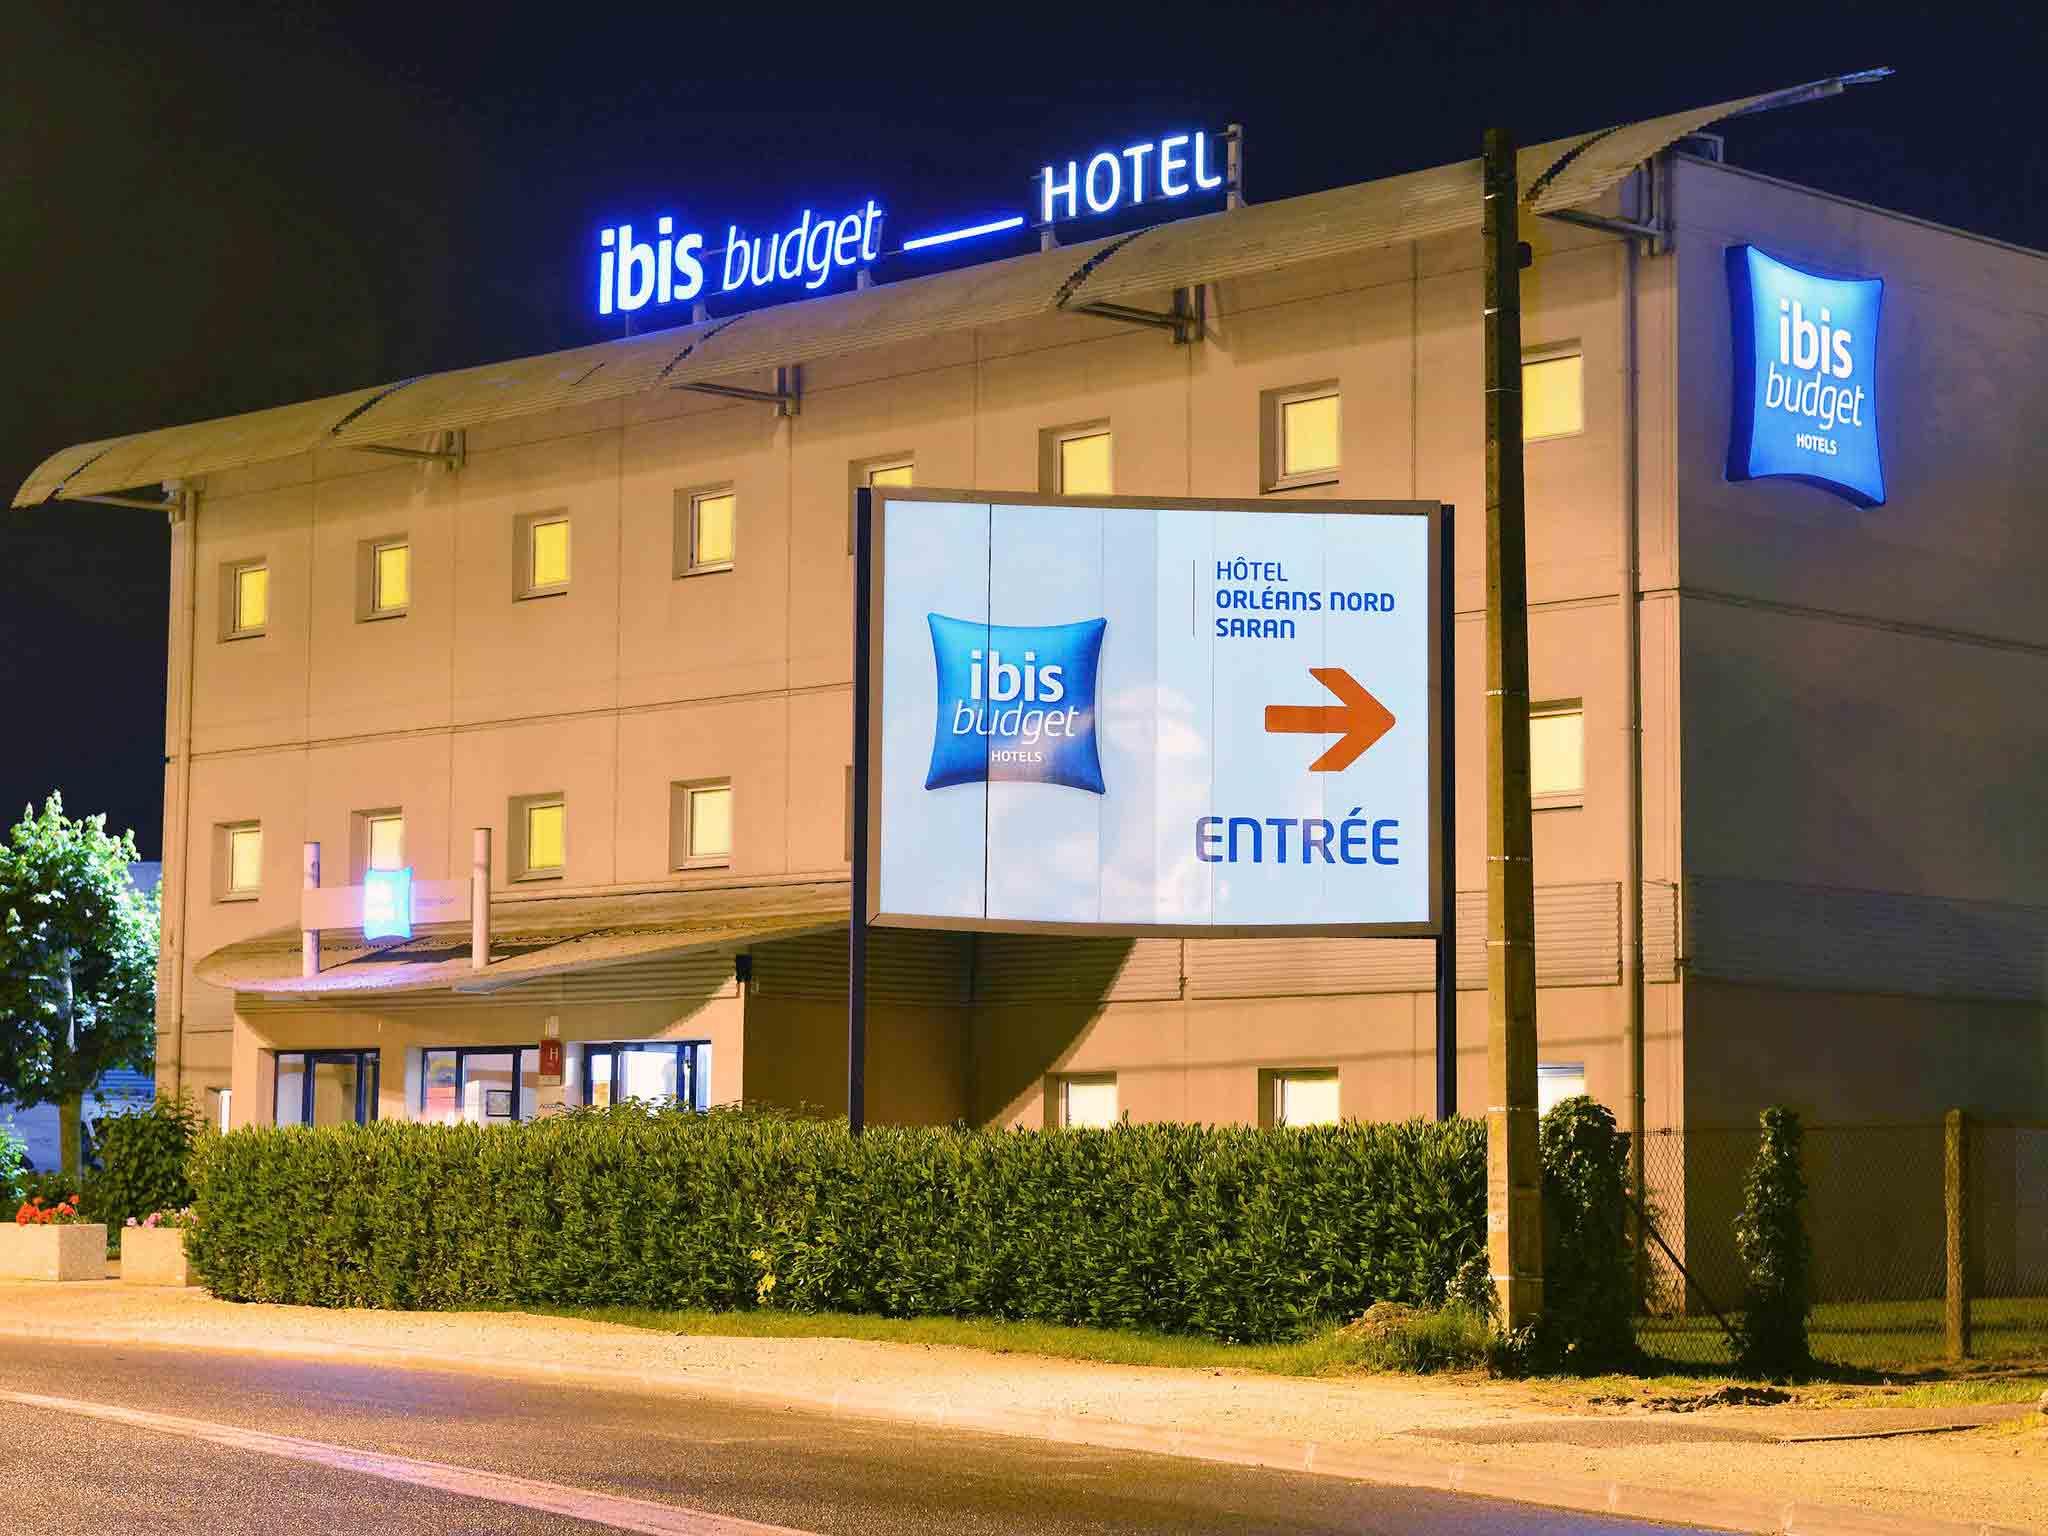 Hôtel - ibis budget Orléans nord Saran